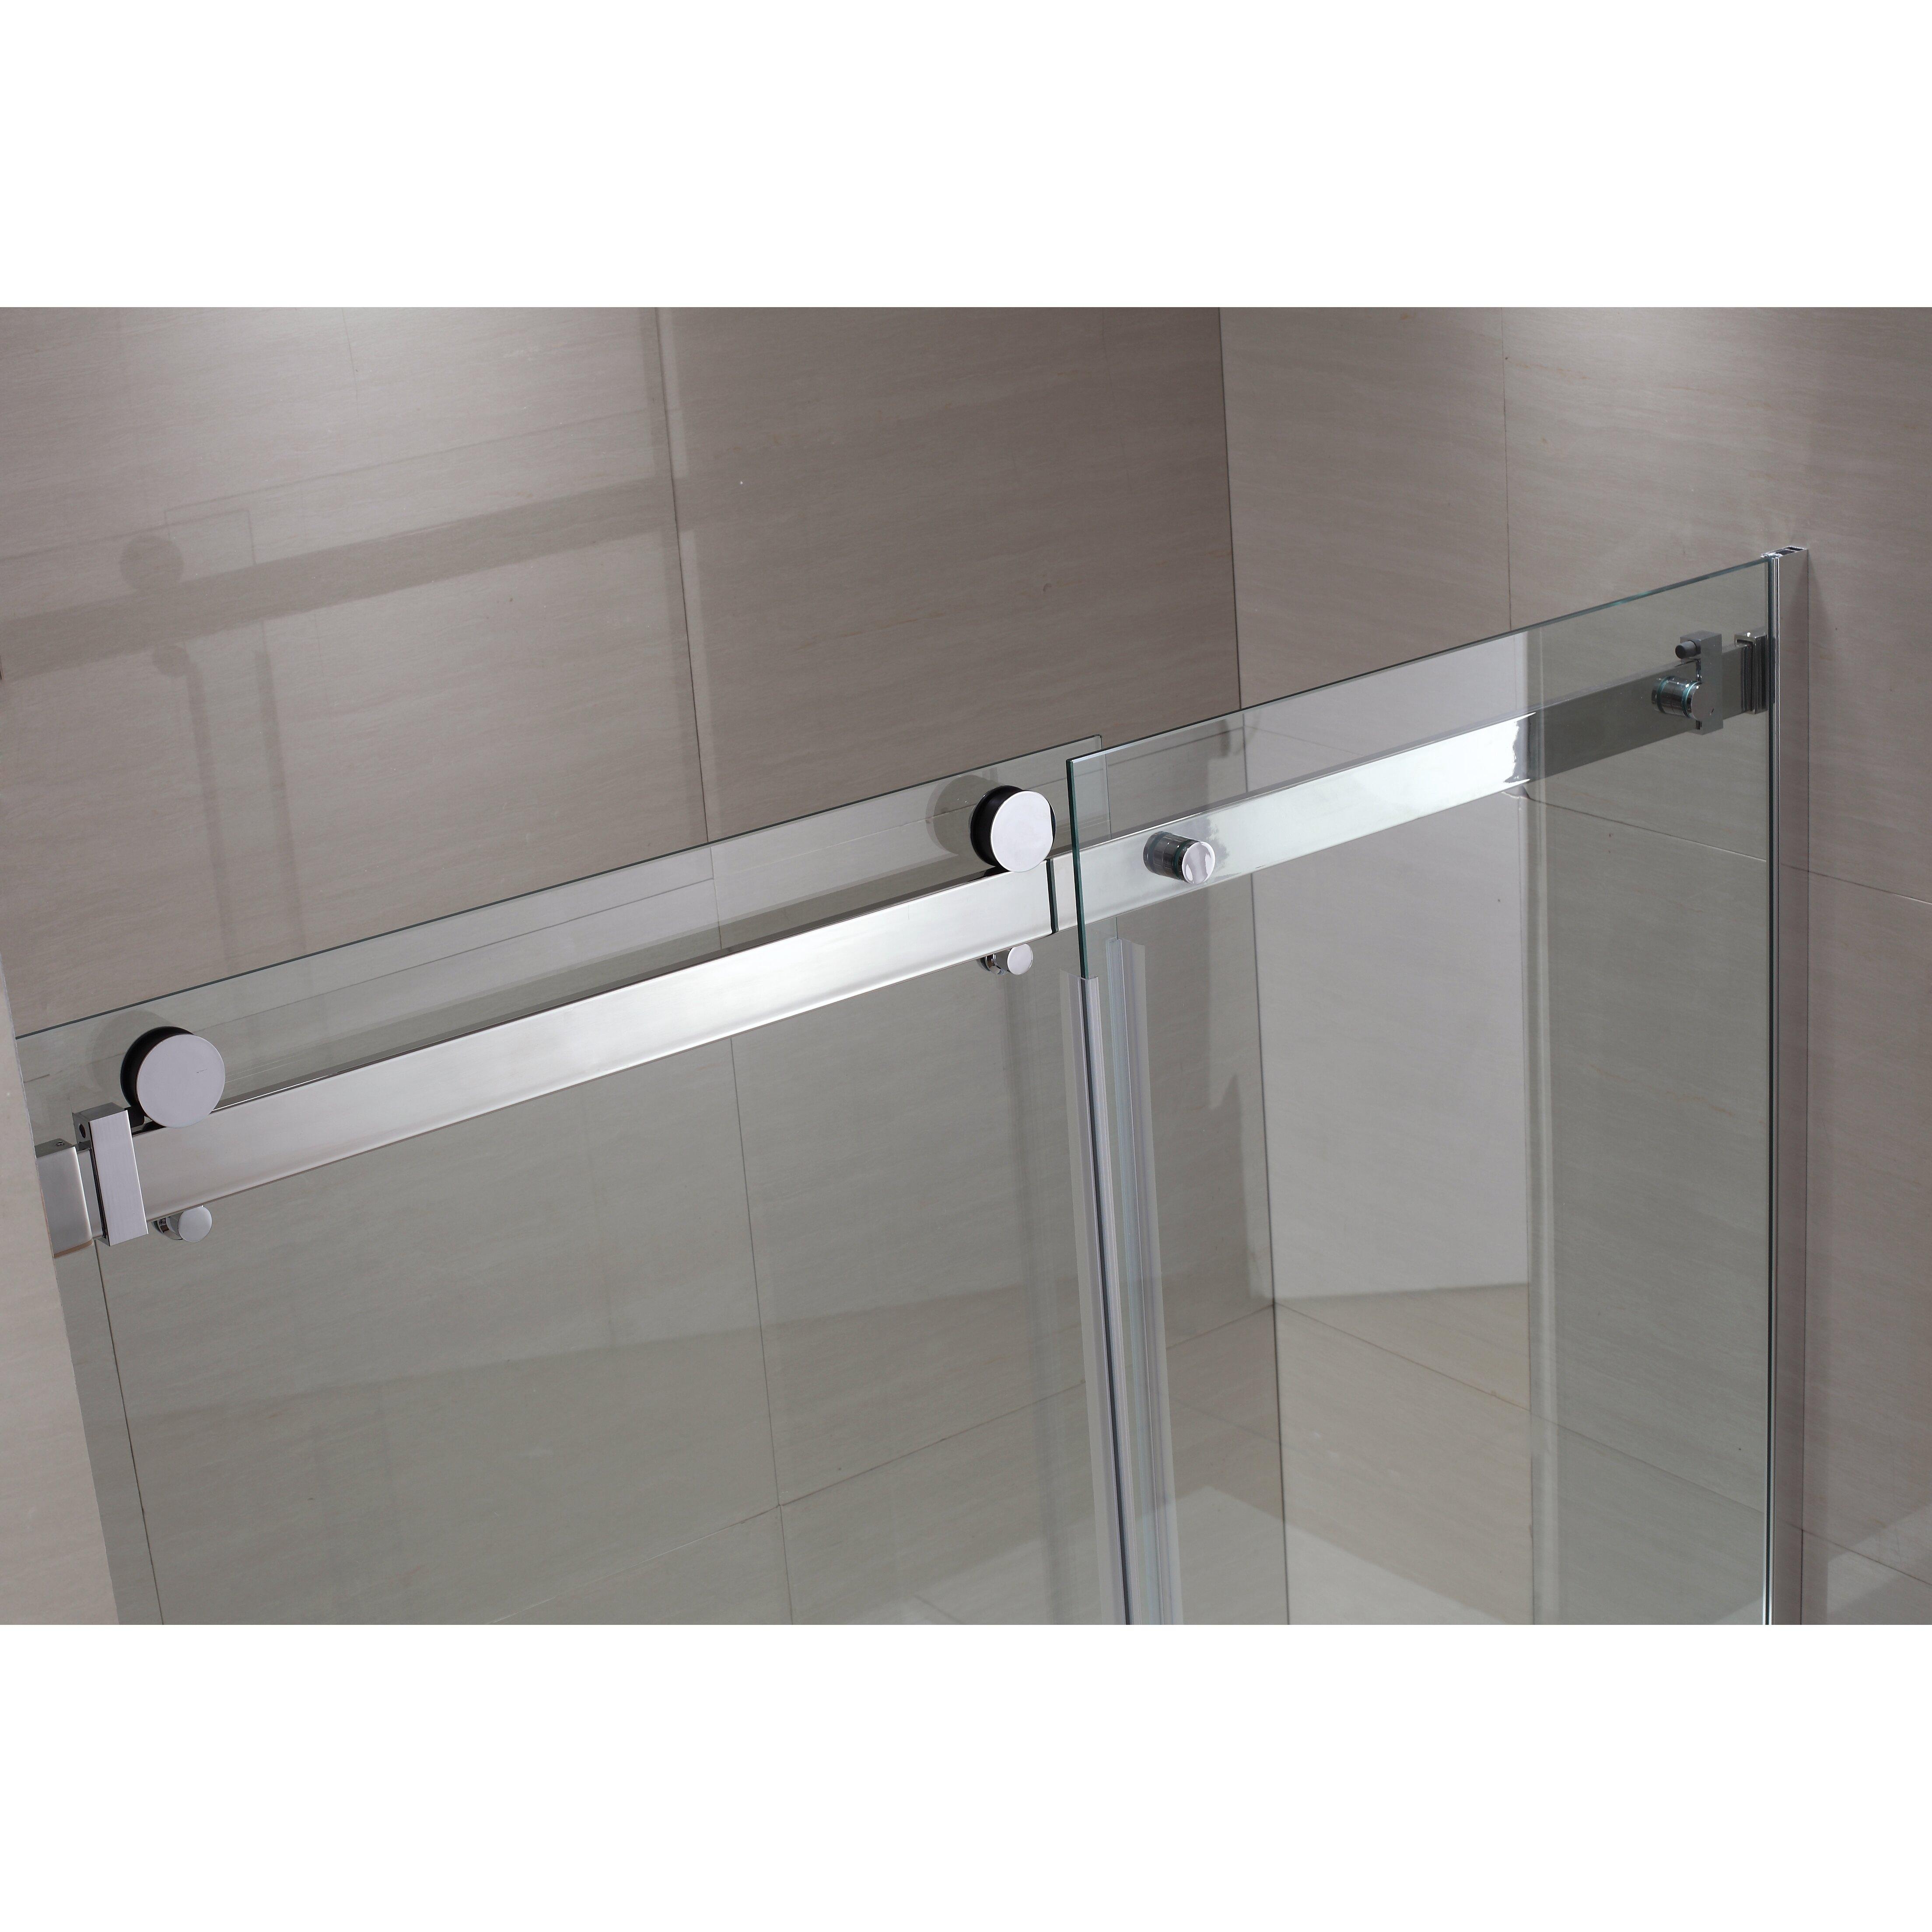 Ove Decors Shower Doors Ove Decors Sierra 59 X 59 Single Sliding Tub Door Reviews